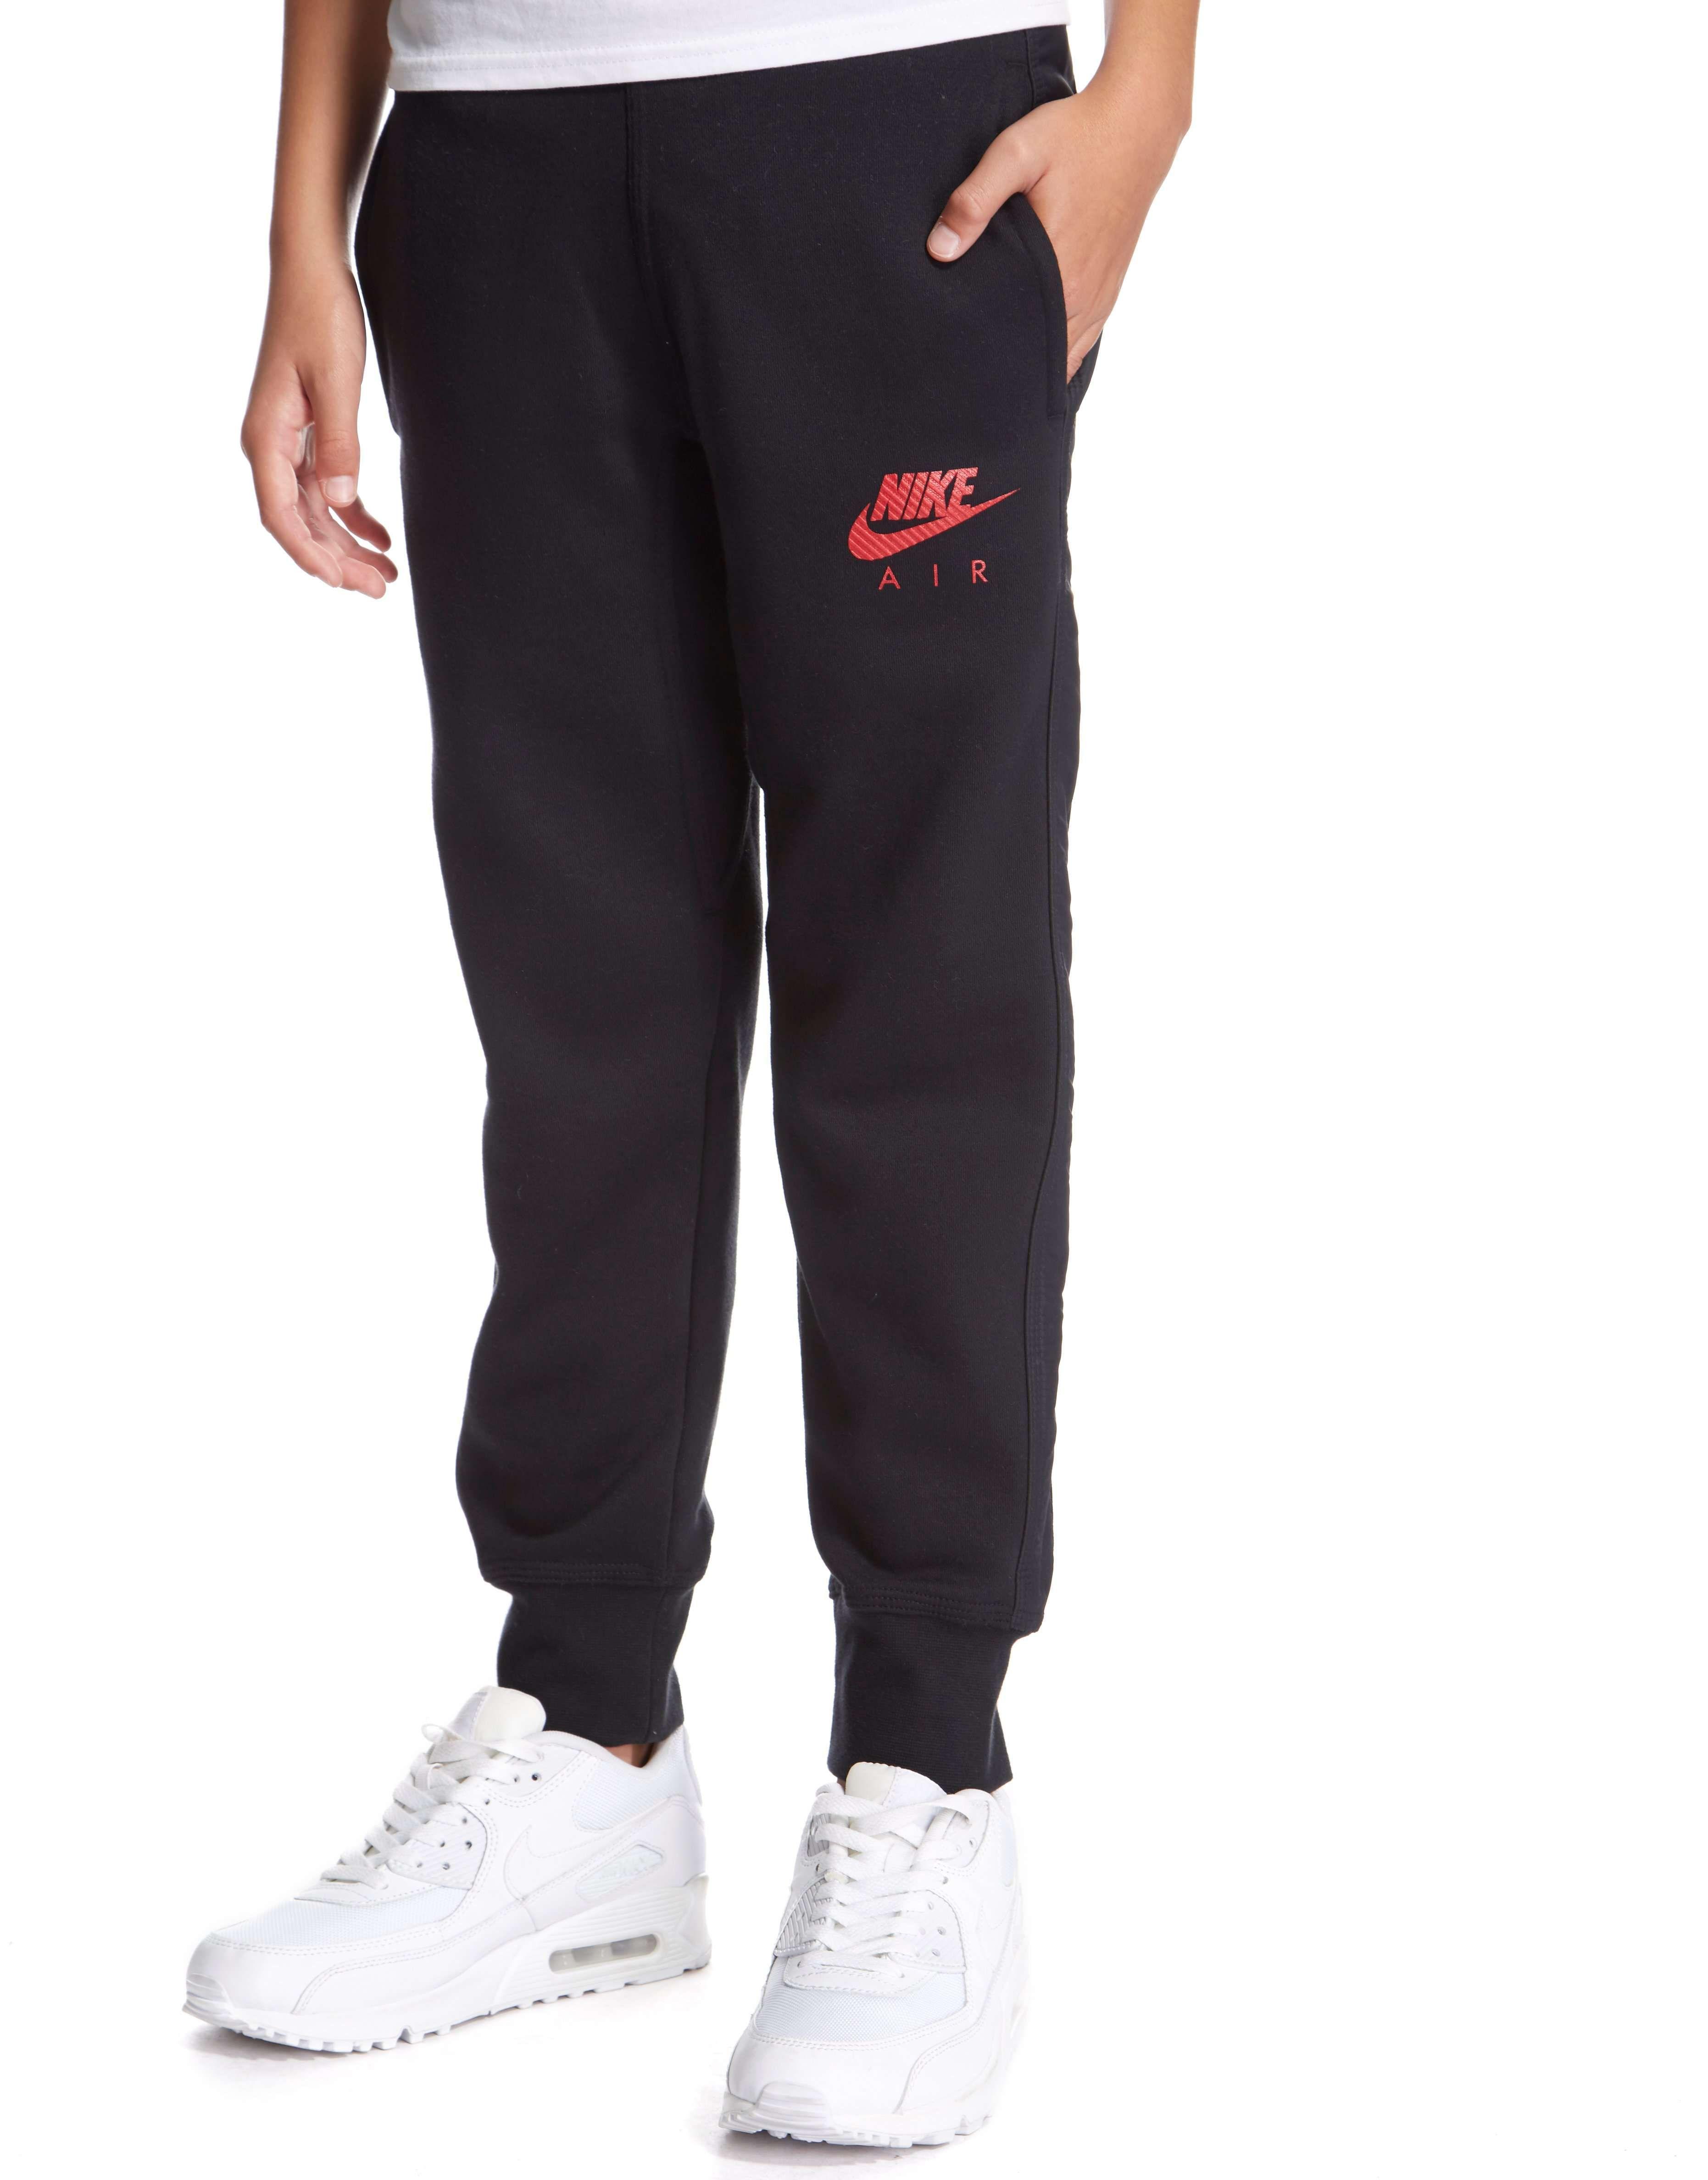 Nike Air Fleece Pants Junior - Shop